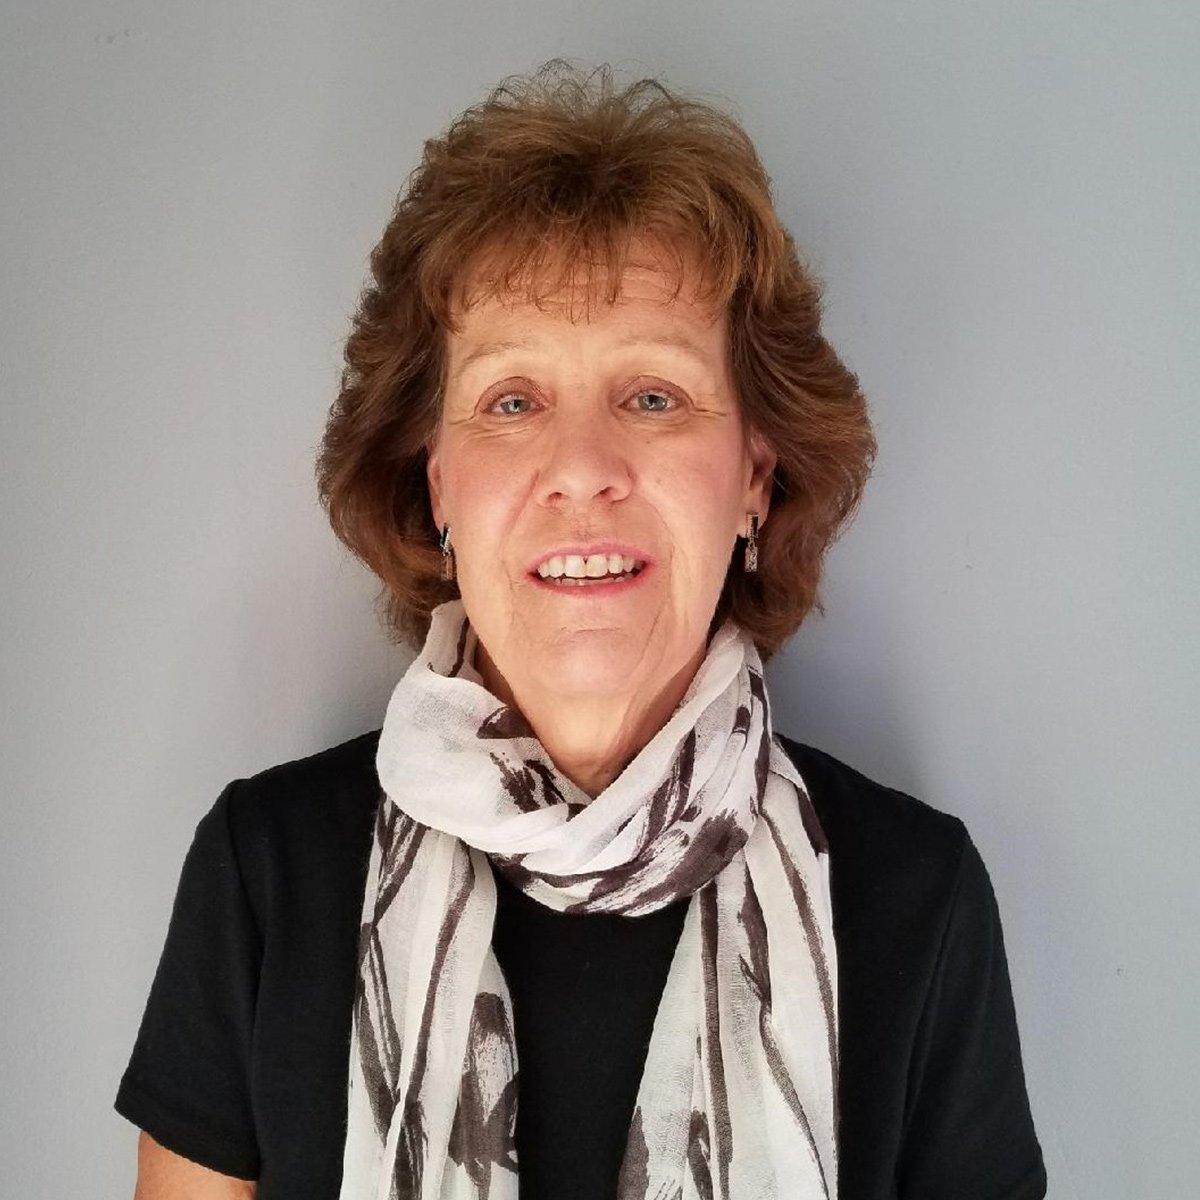 Kathy Stoermer